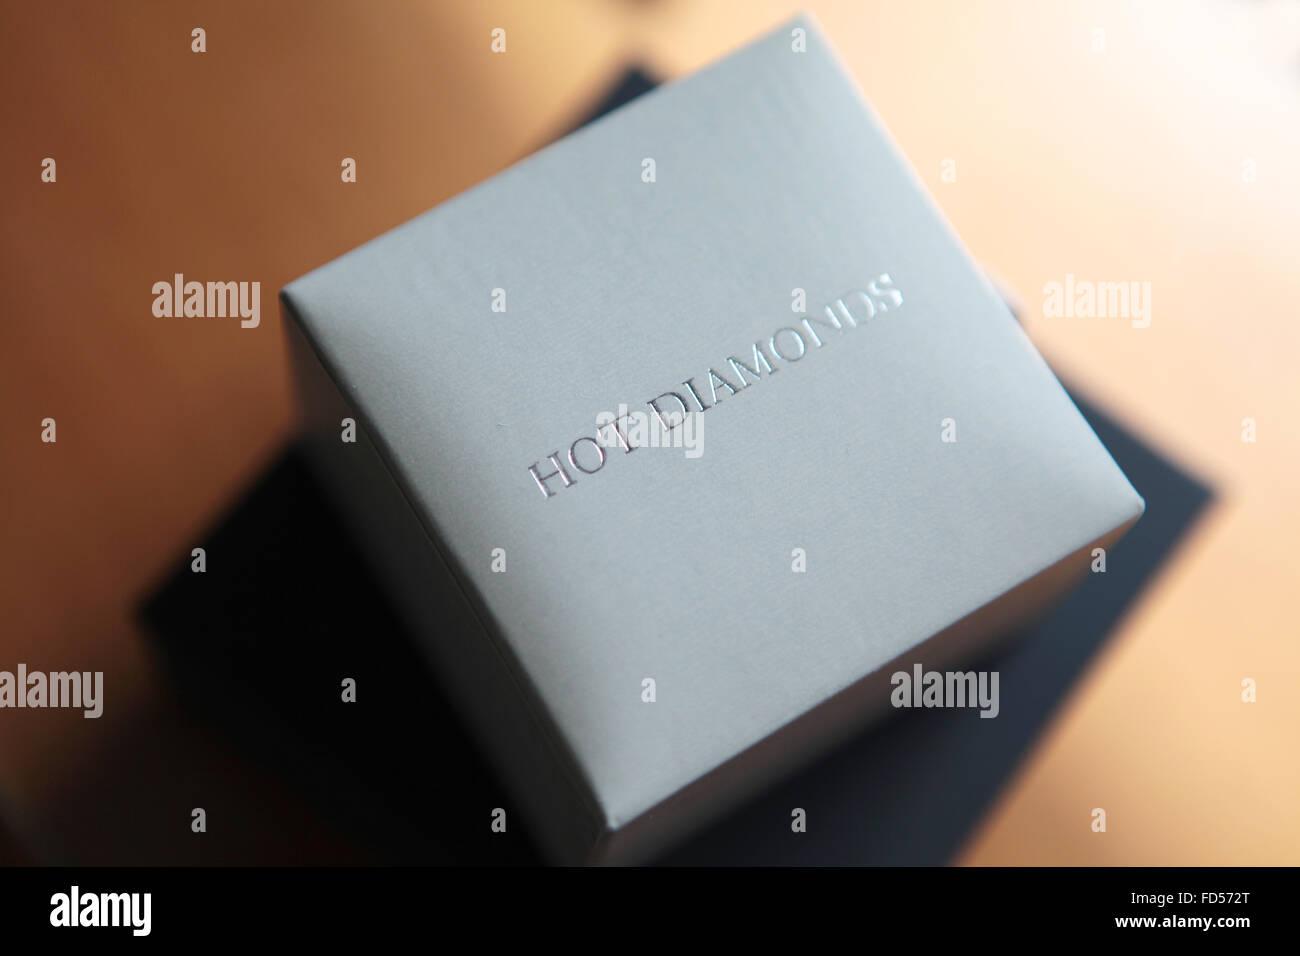 Hot Diamonds - Stock Image